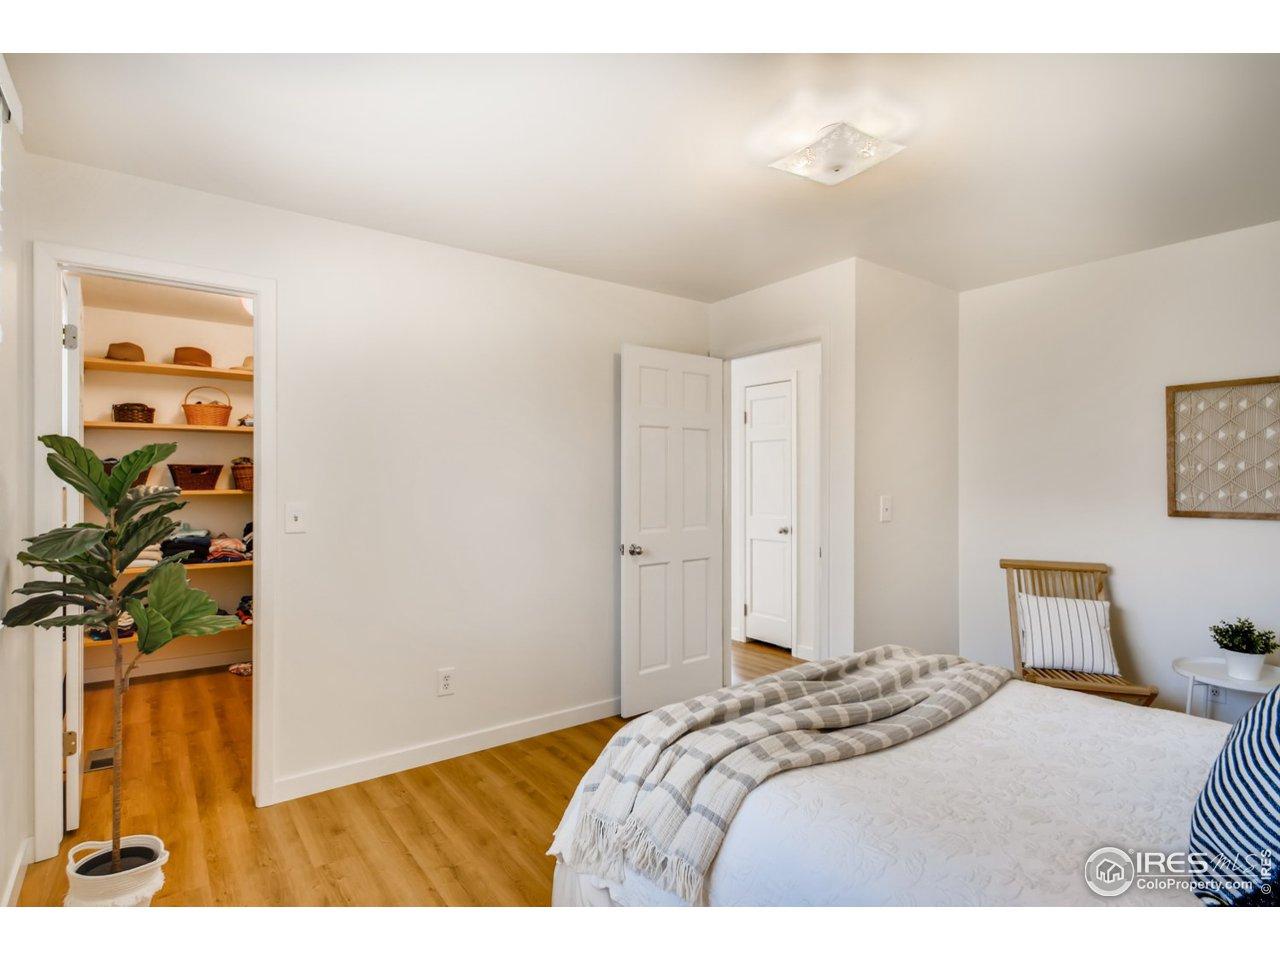 Main bedroom closet view